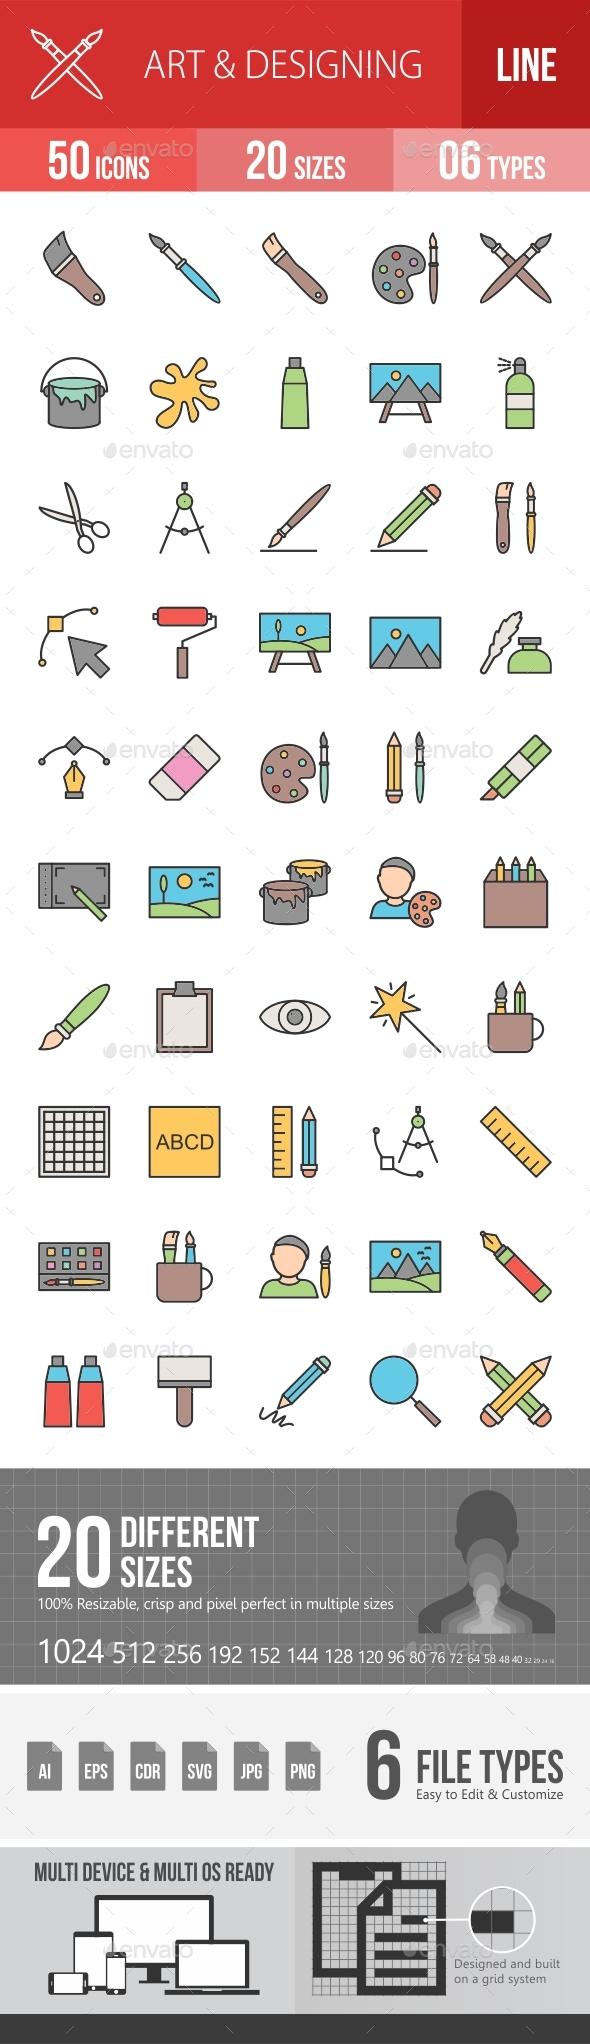 Art & Designing Filled Line Icons Season II